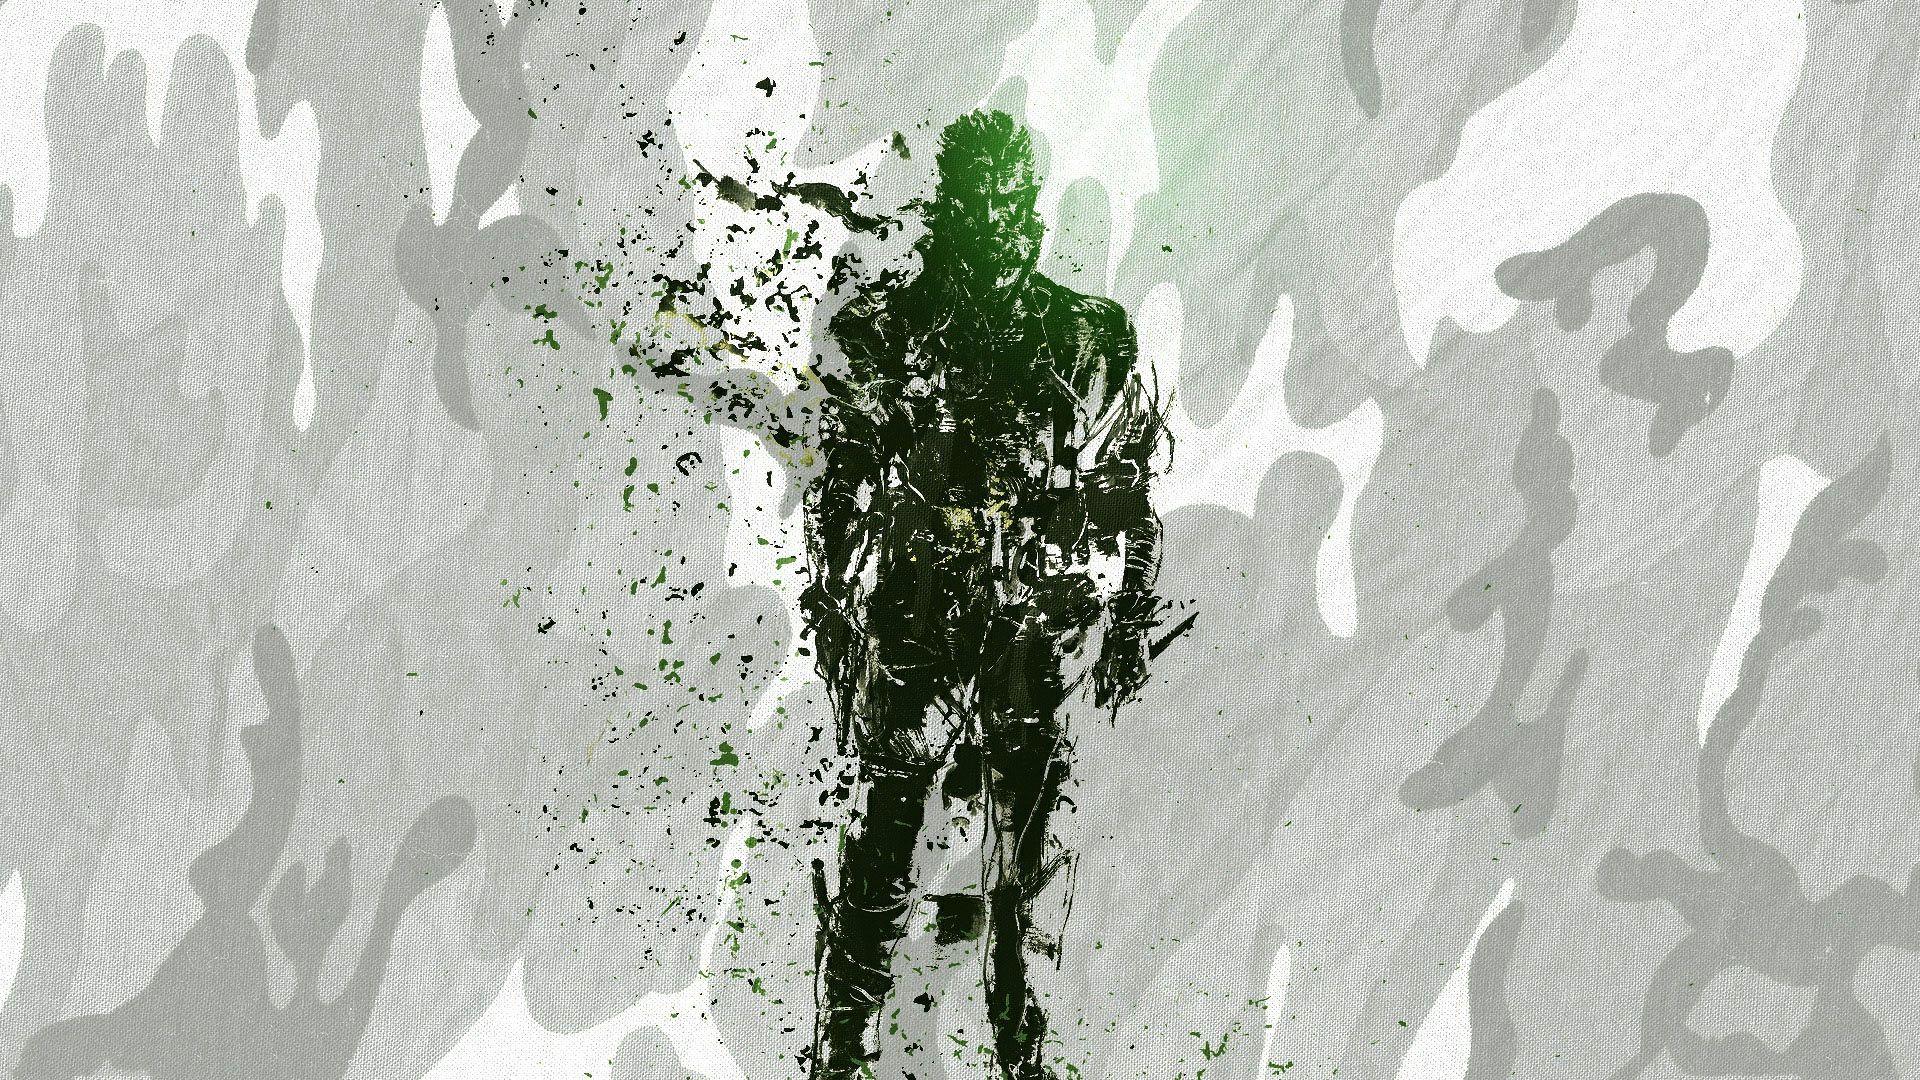 Pin On Metal Gear Solid V The Phantom Pain